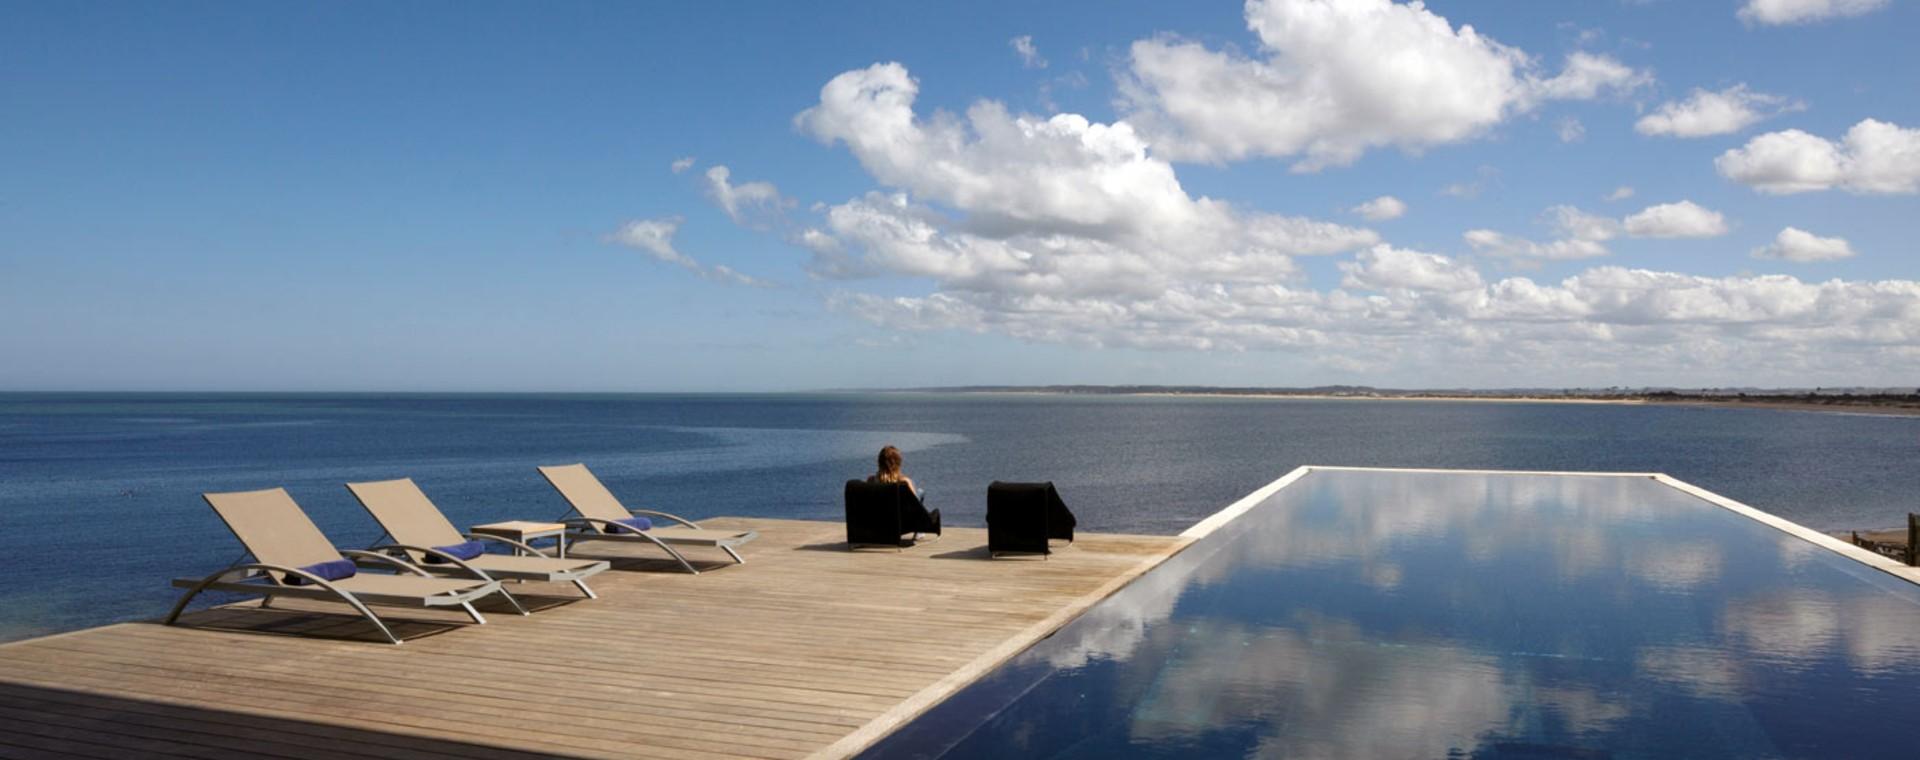 Playa Vik, Uruguay | Plan South America